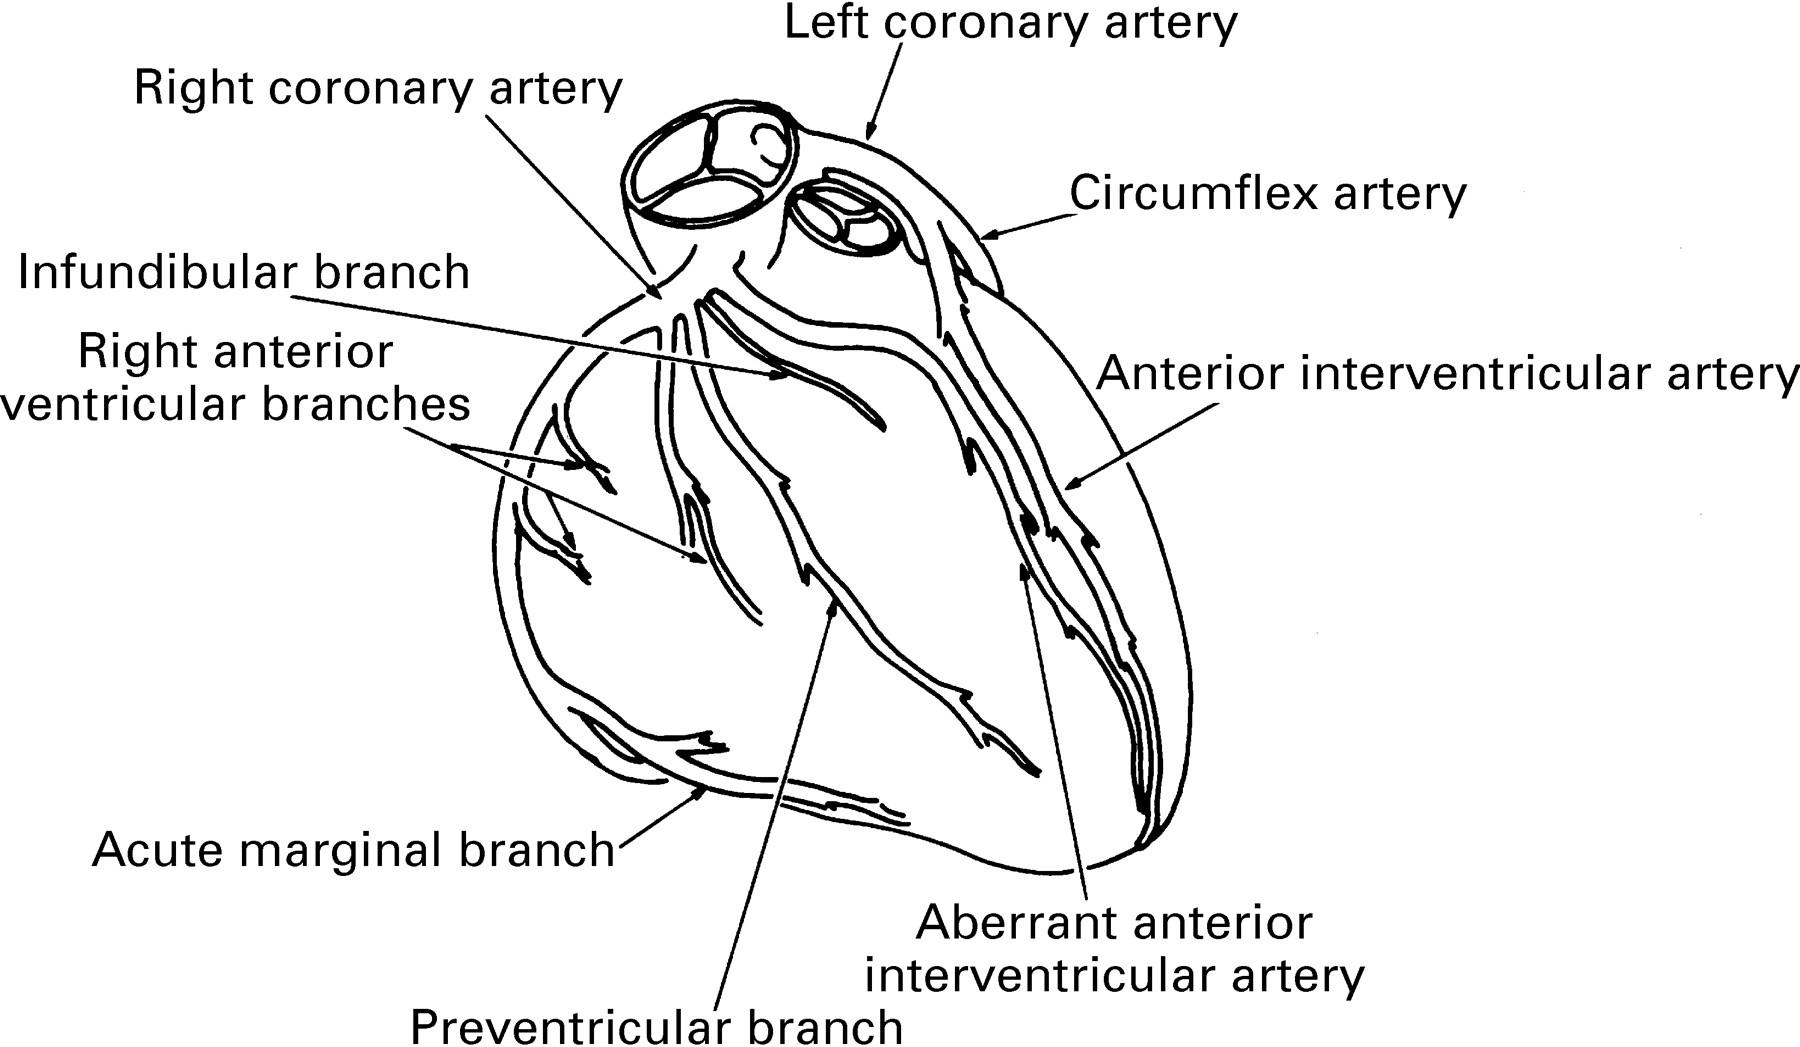 Coronary arterial anatomy in tetralogy of Fallot: morphological and ...